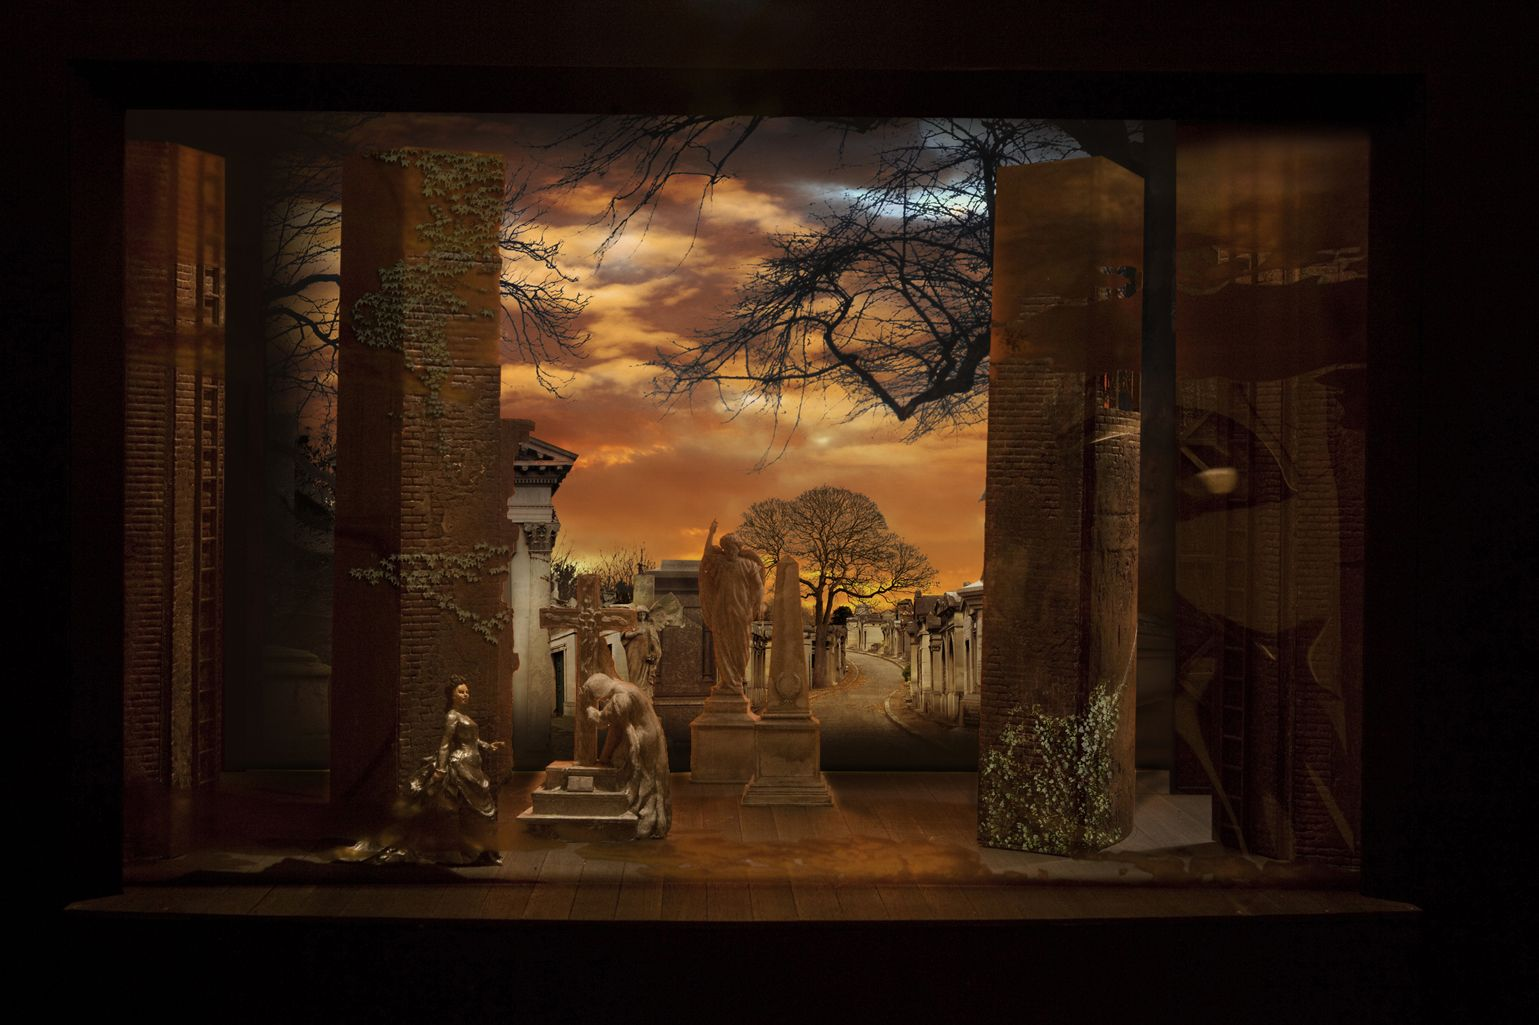 Phantom of the opera stage